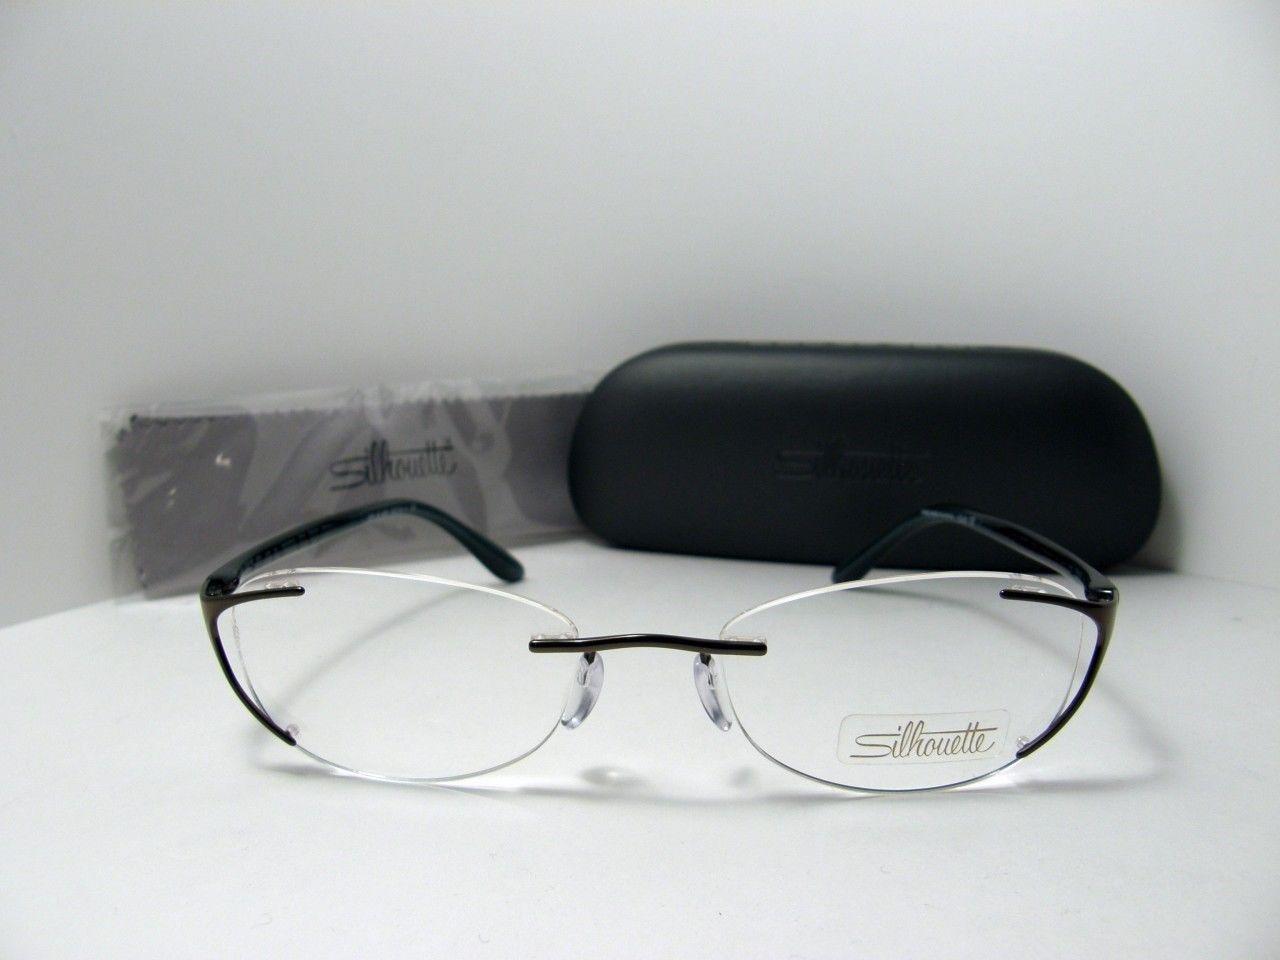 Eyeglass Frames Silhouette Titanium : New Authentic Silhouette Titanium Rimless Eyeglasses 6659 ...